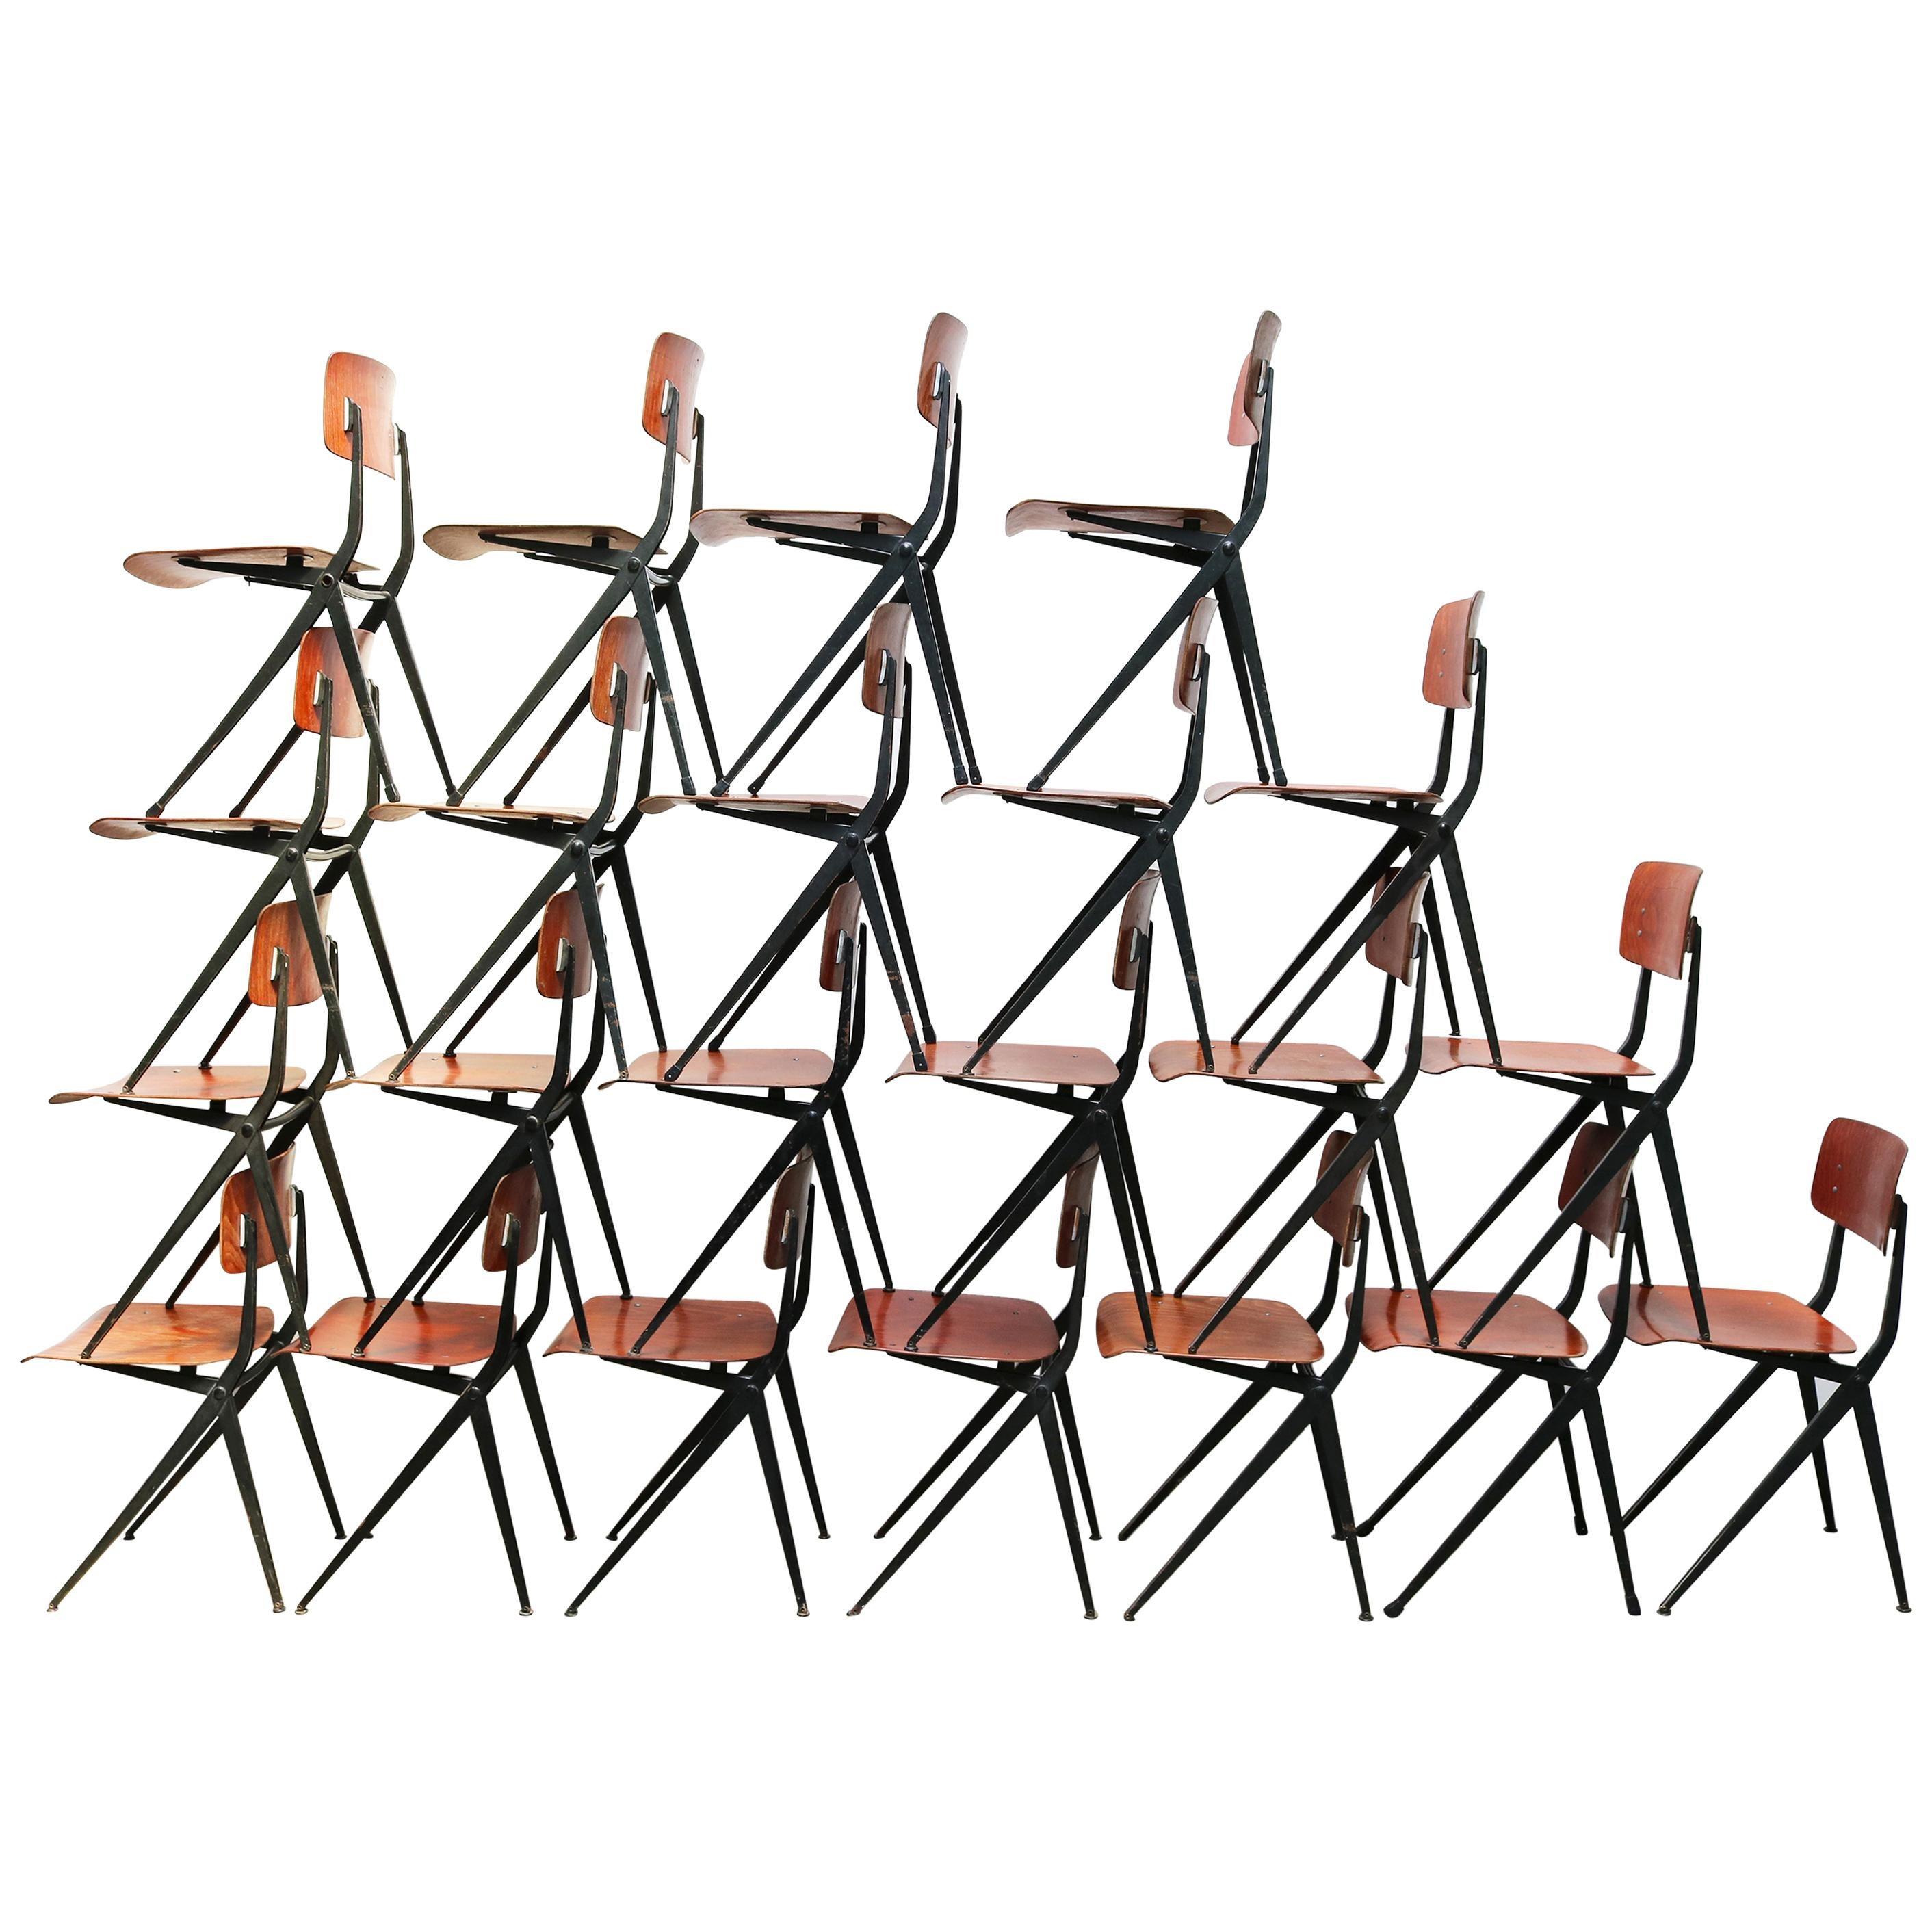 1 of 32 Dutch Marko Industrial Friso Kramer Design Dining Chairs Compass 1950